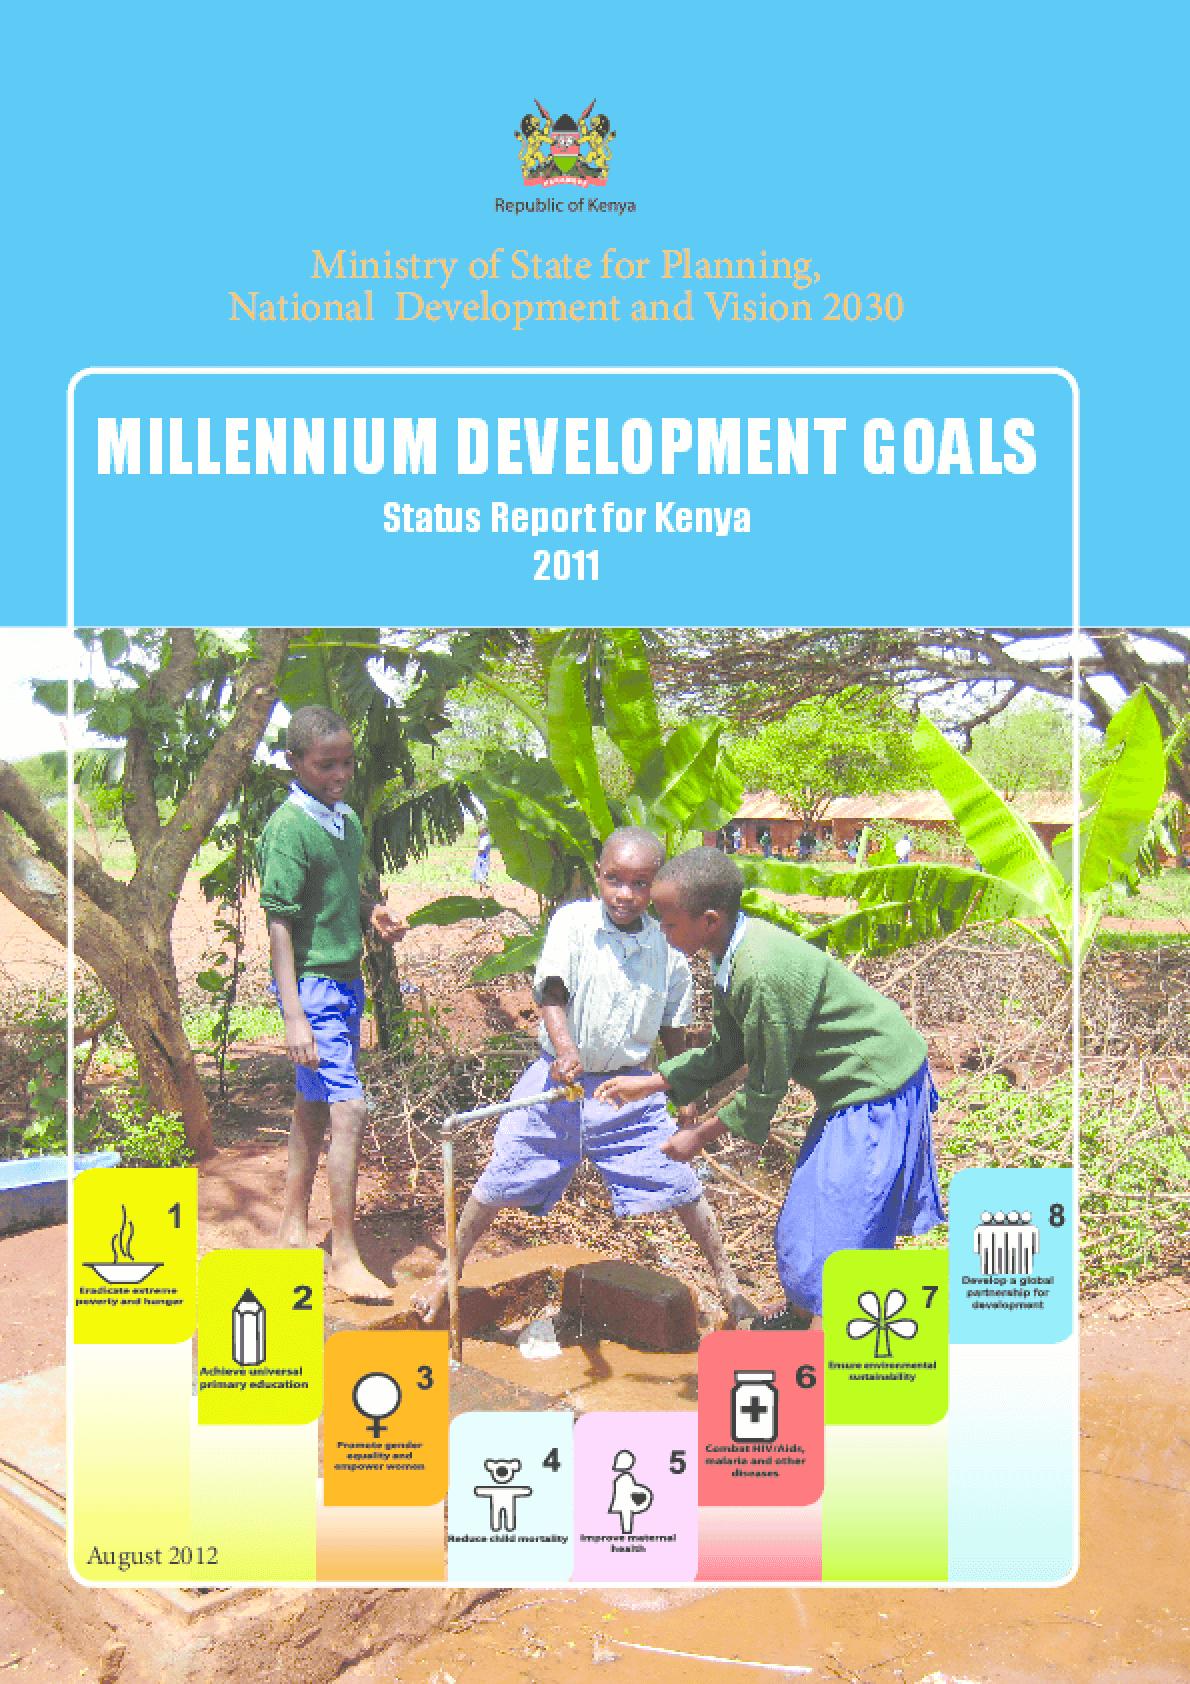 Millennium Development Goals: Status Report for Kenya 2011